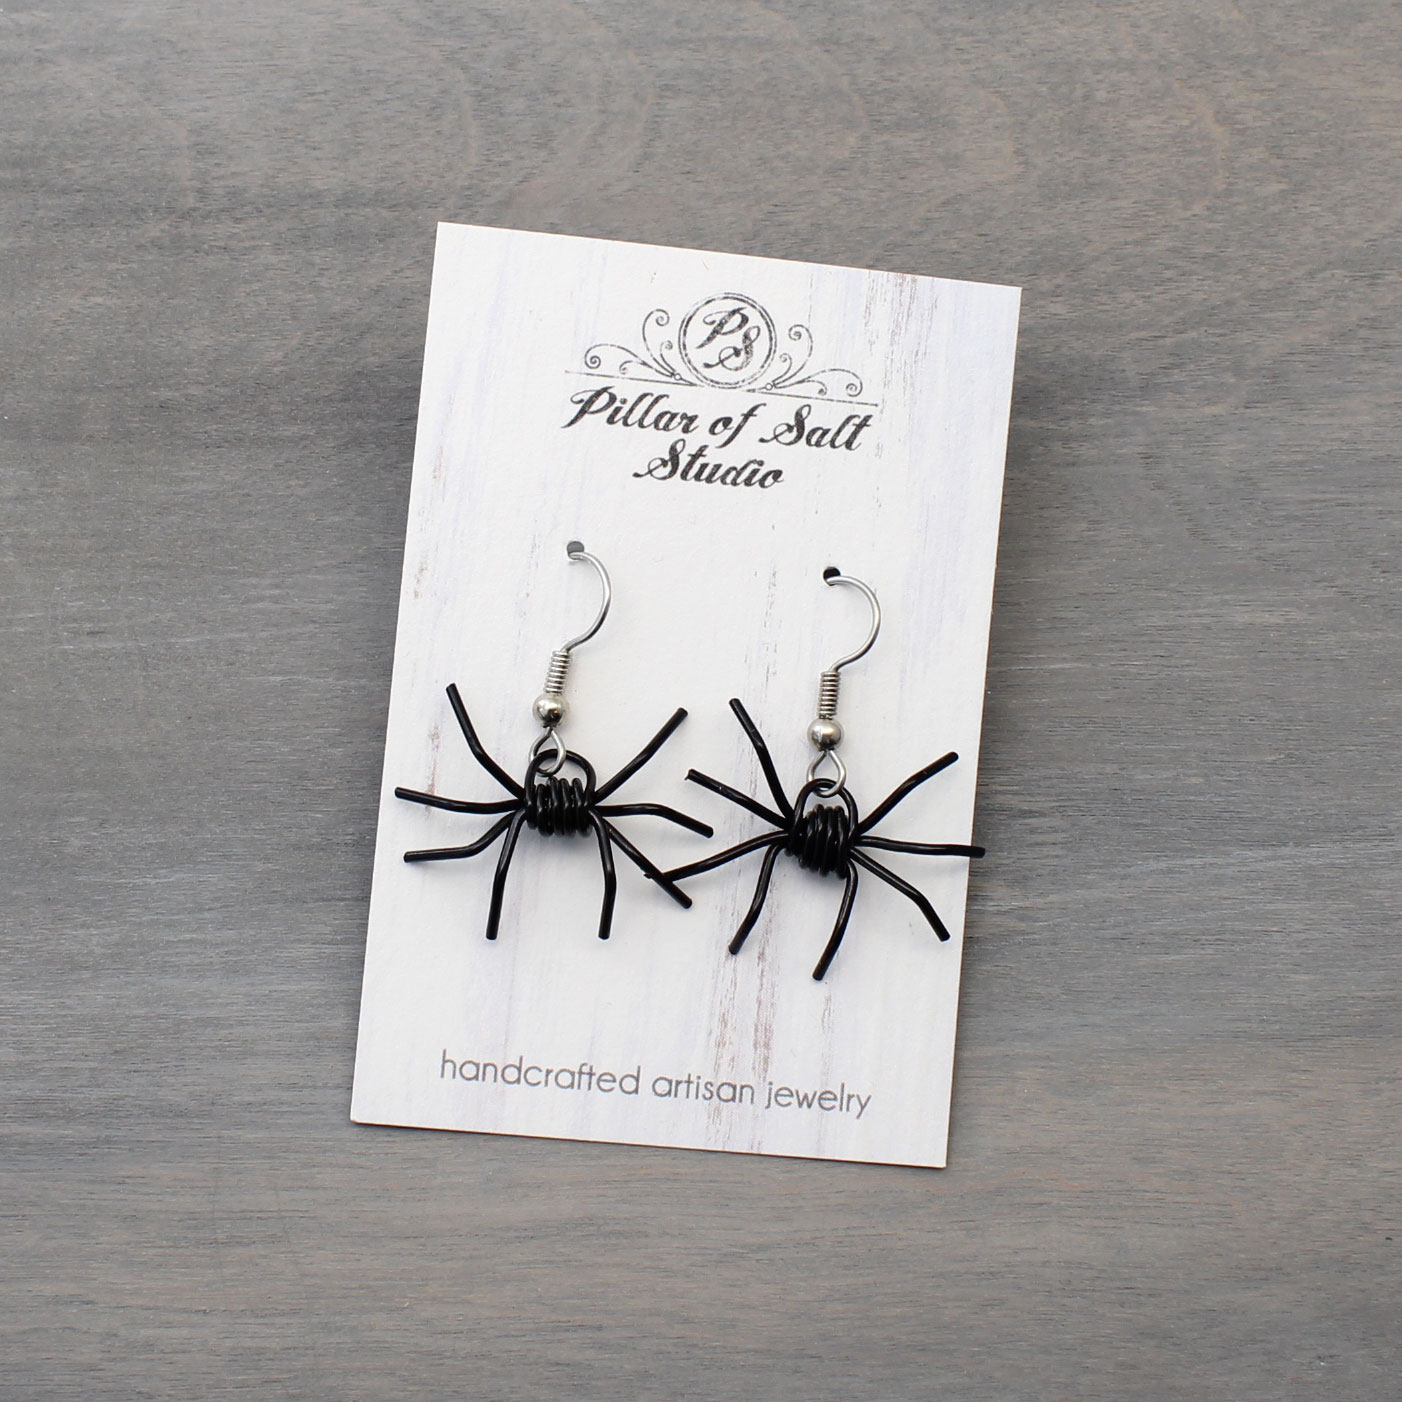 Pillar of Salt Studio wire wrapped spider earrings